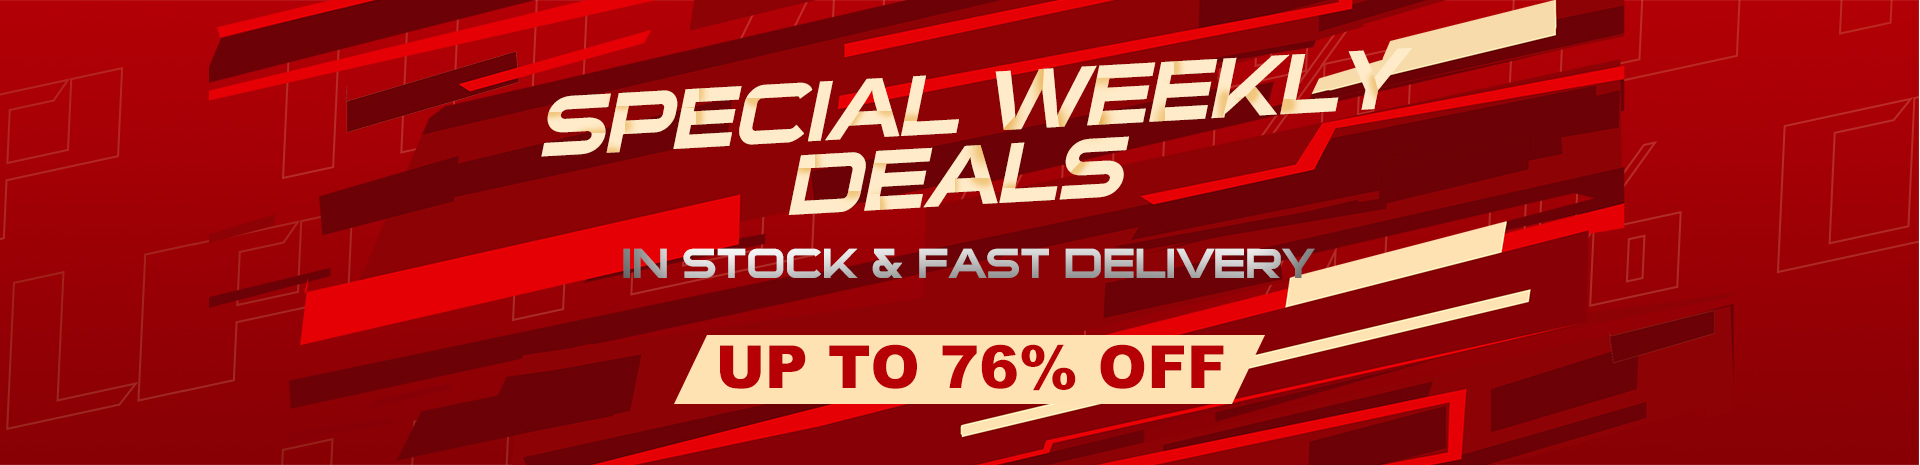 Special Weekly Deals